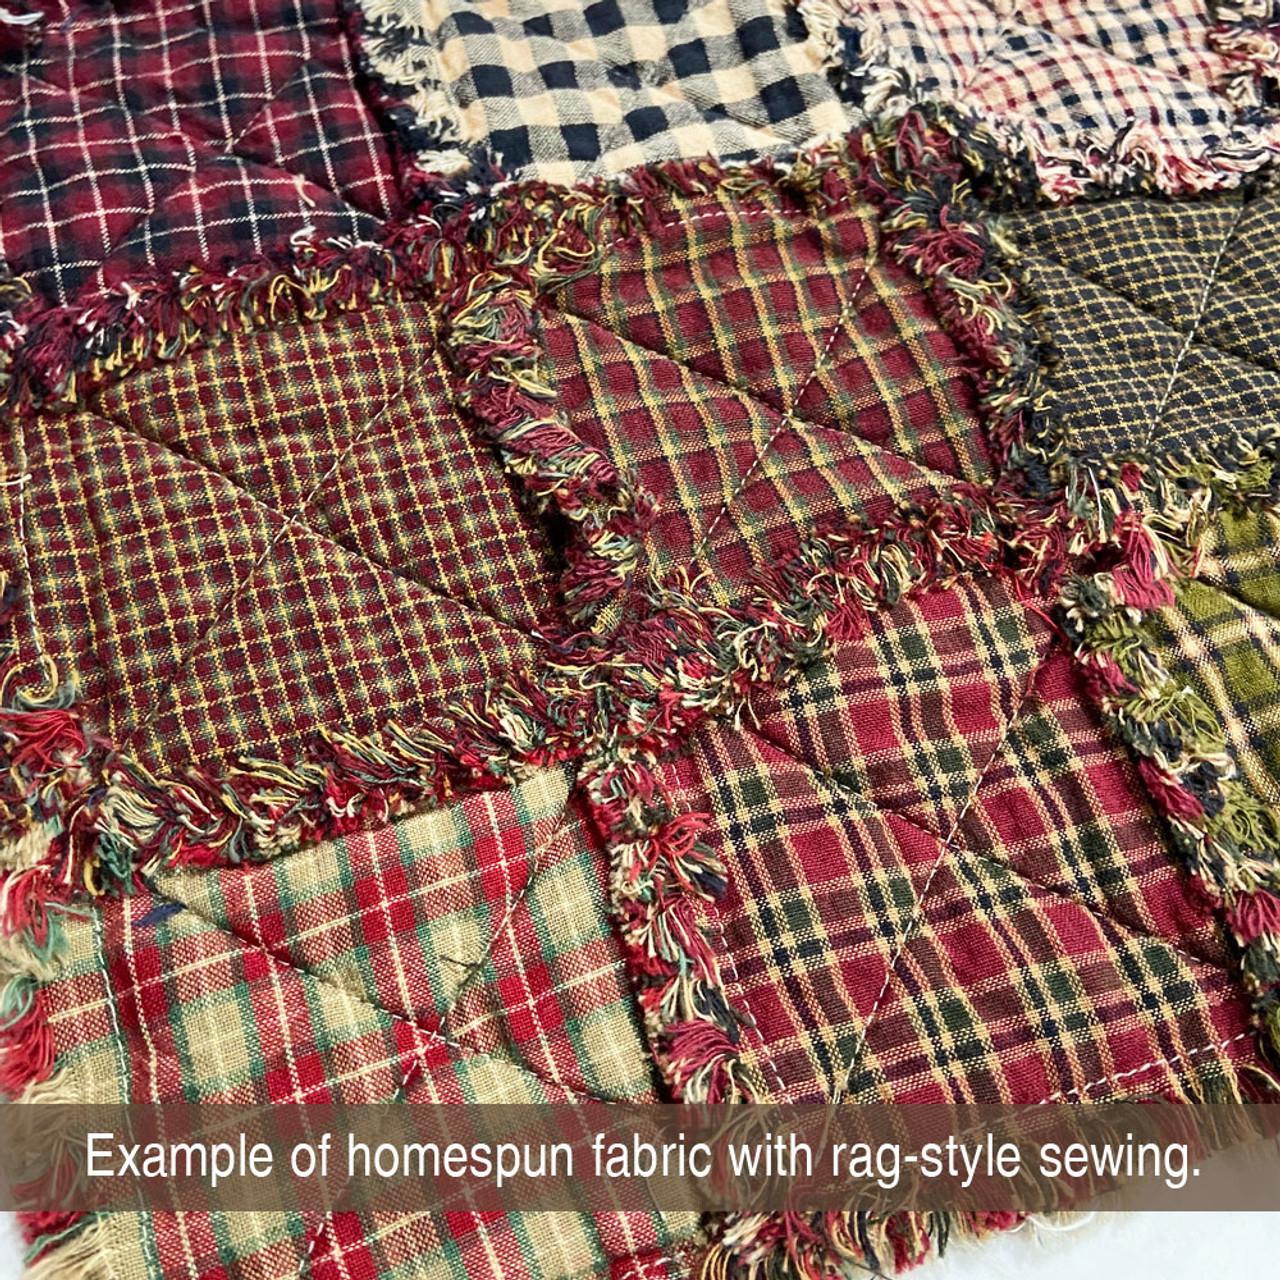 Red & Black Homespun Cotton Fabric